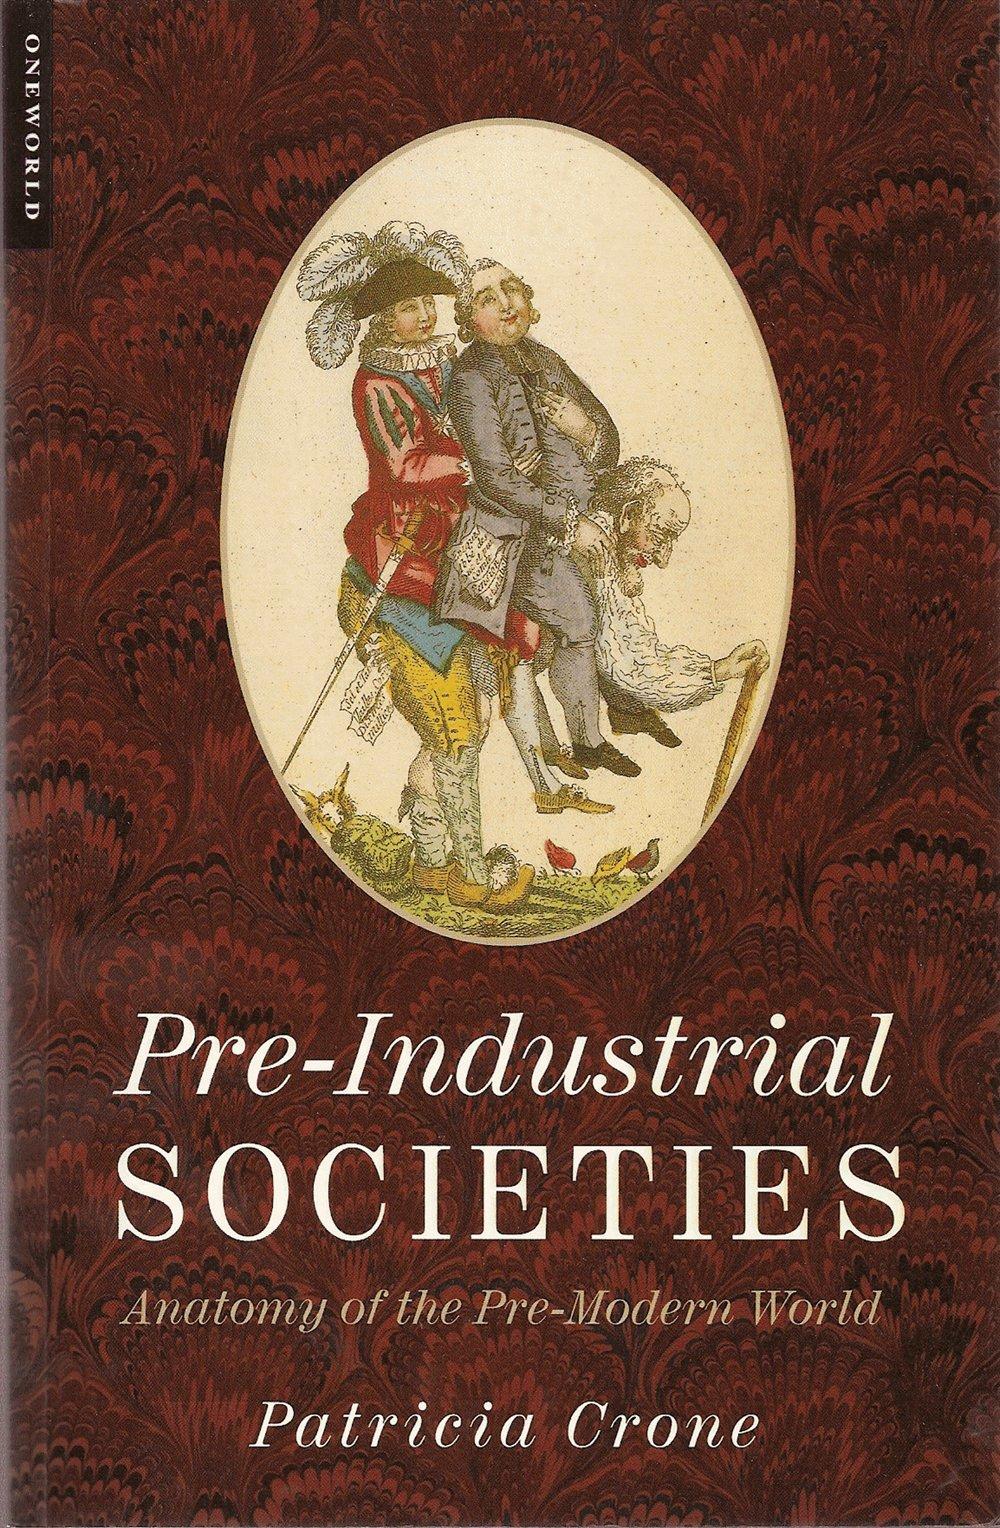 Pre-Industrial Societies Anatomy of the Pre-Modern World